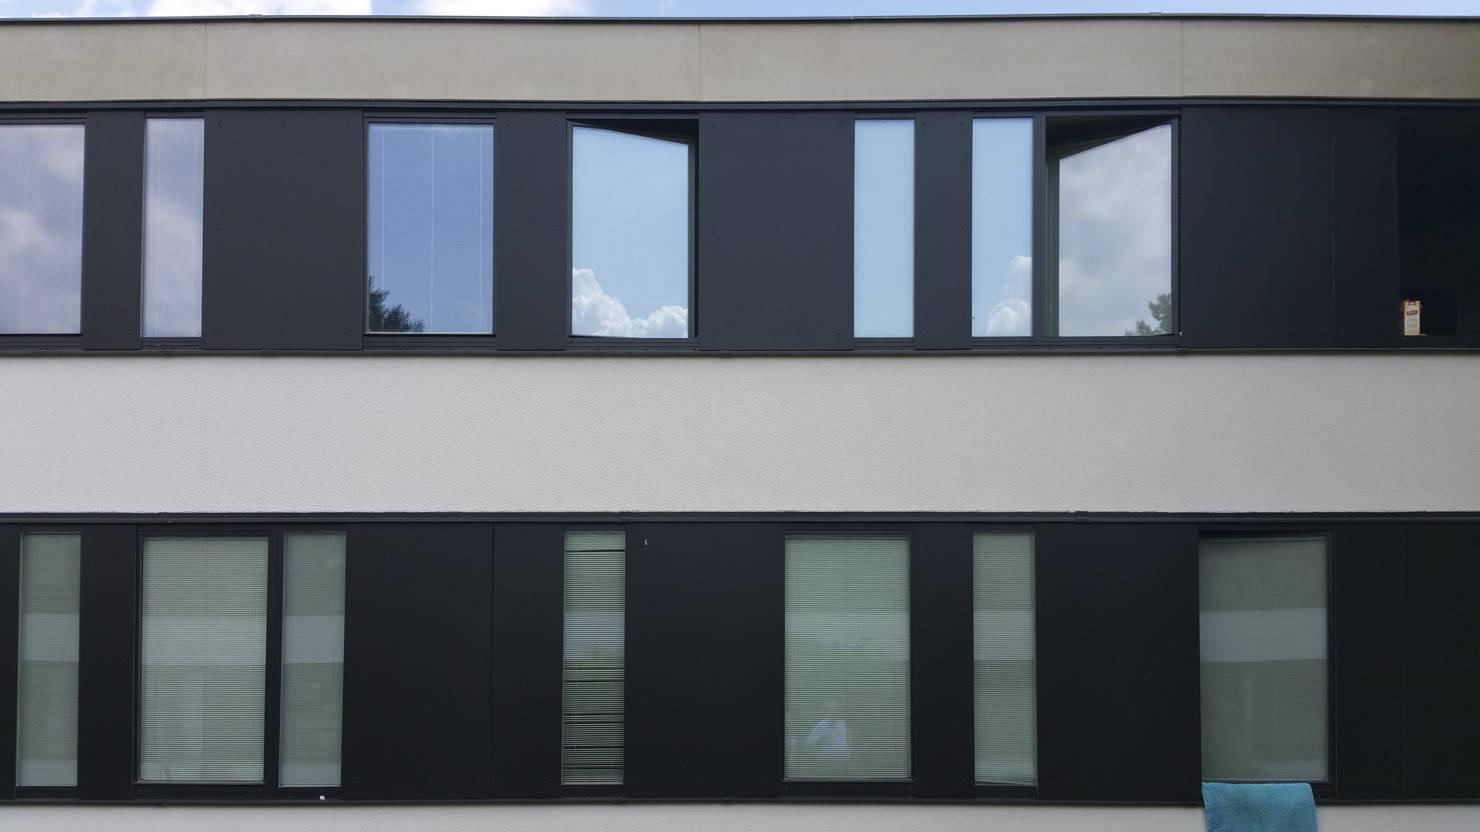 acciaio-zincato-serramenti-autzen-and-reimers-citta-universitaria-schlachtensee-4_project_big